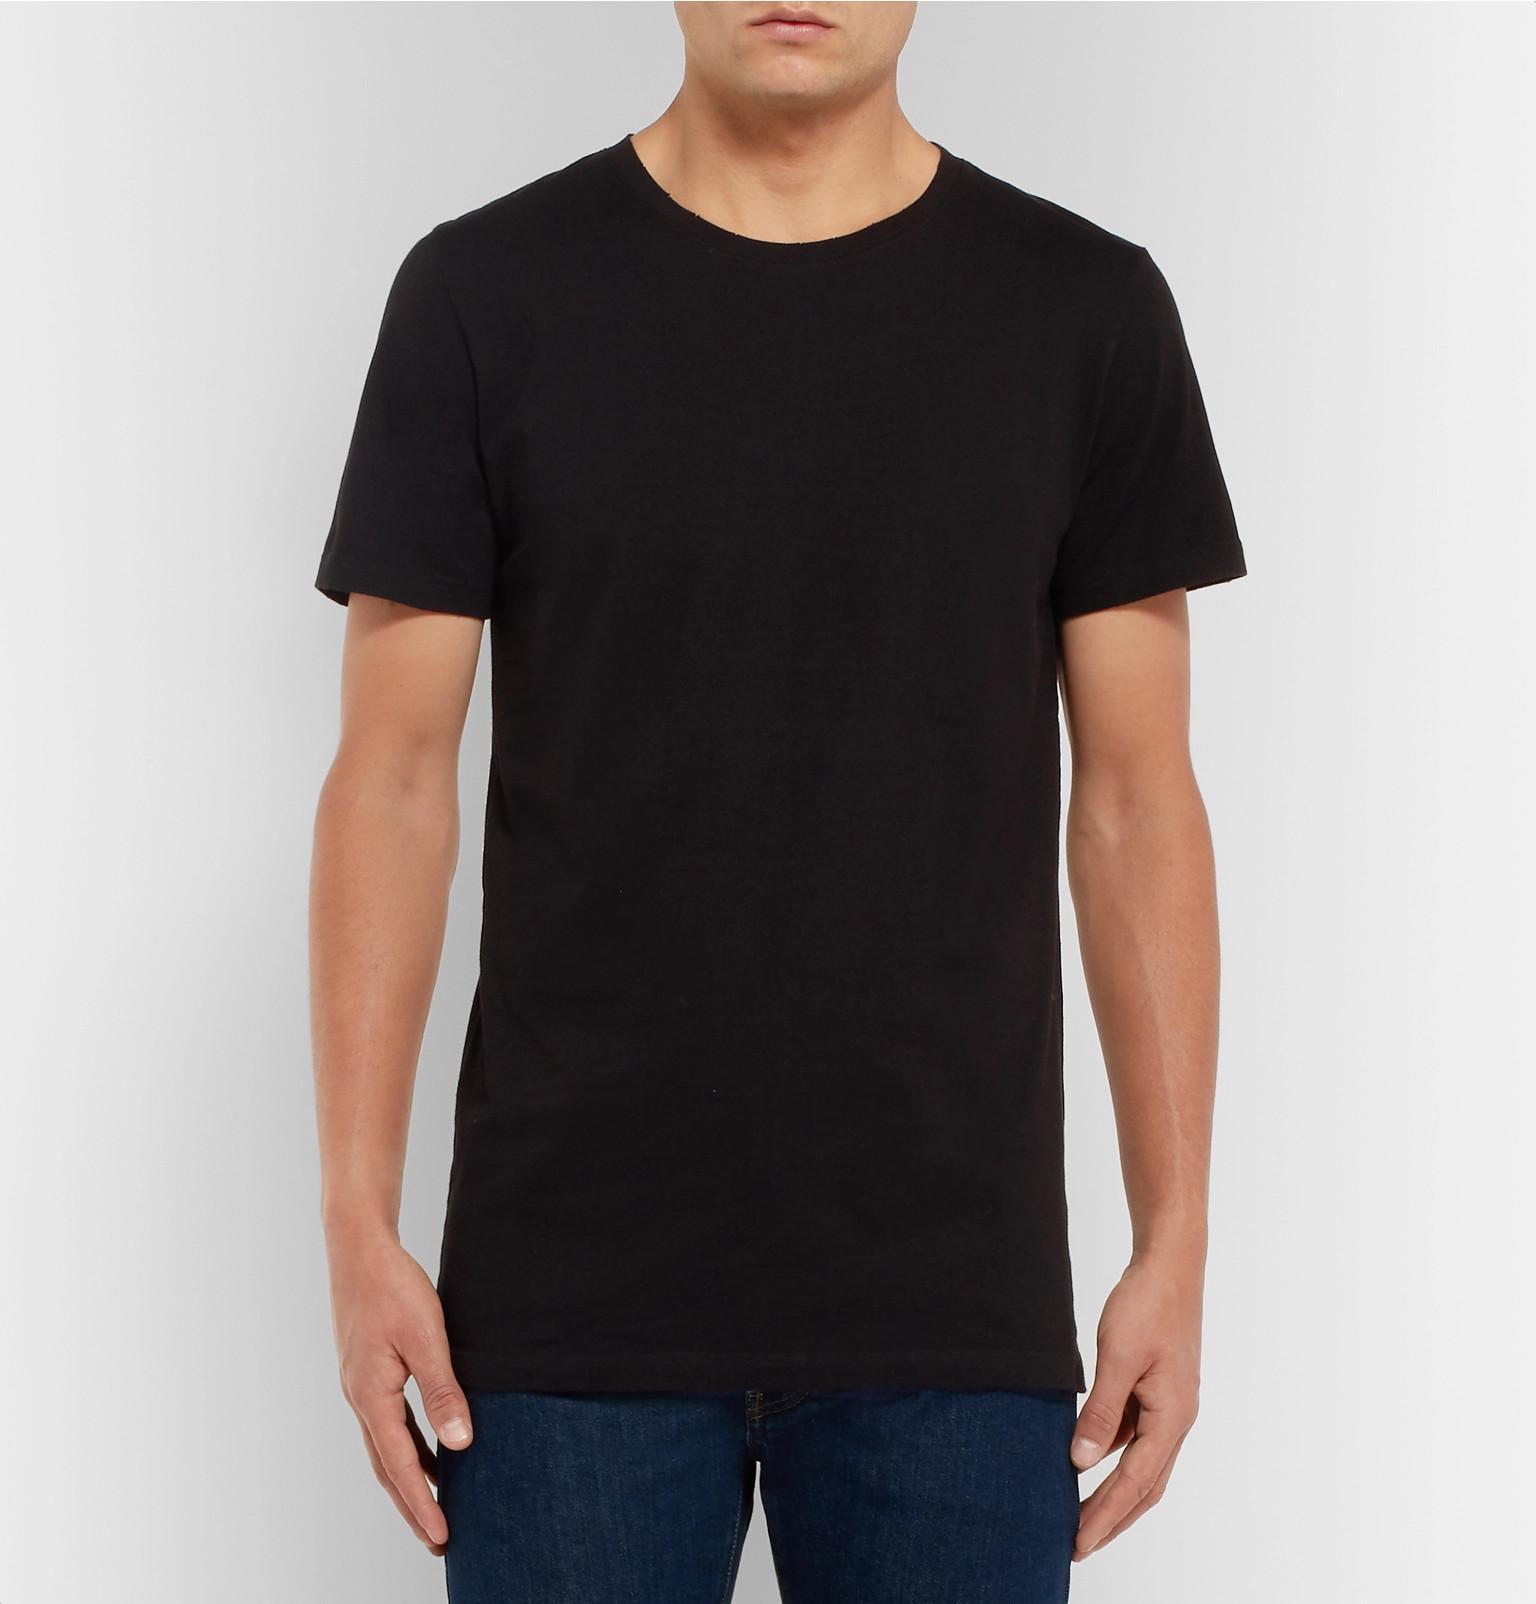 ff6ccc66fa balmain-multi-Three-pack-Slim-fit-Distressed-Cotton-jersey-T-shirts.jpeg